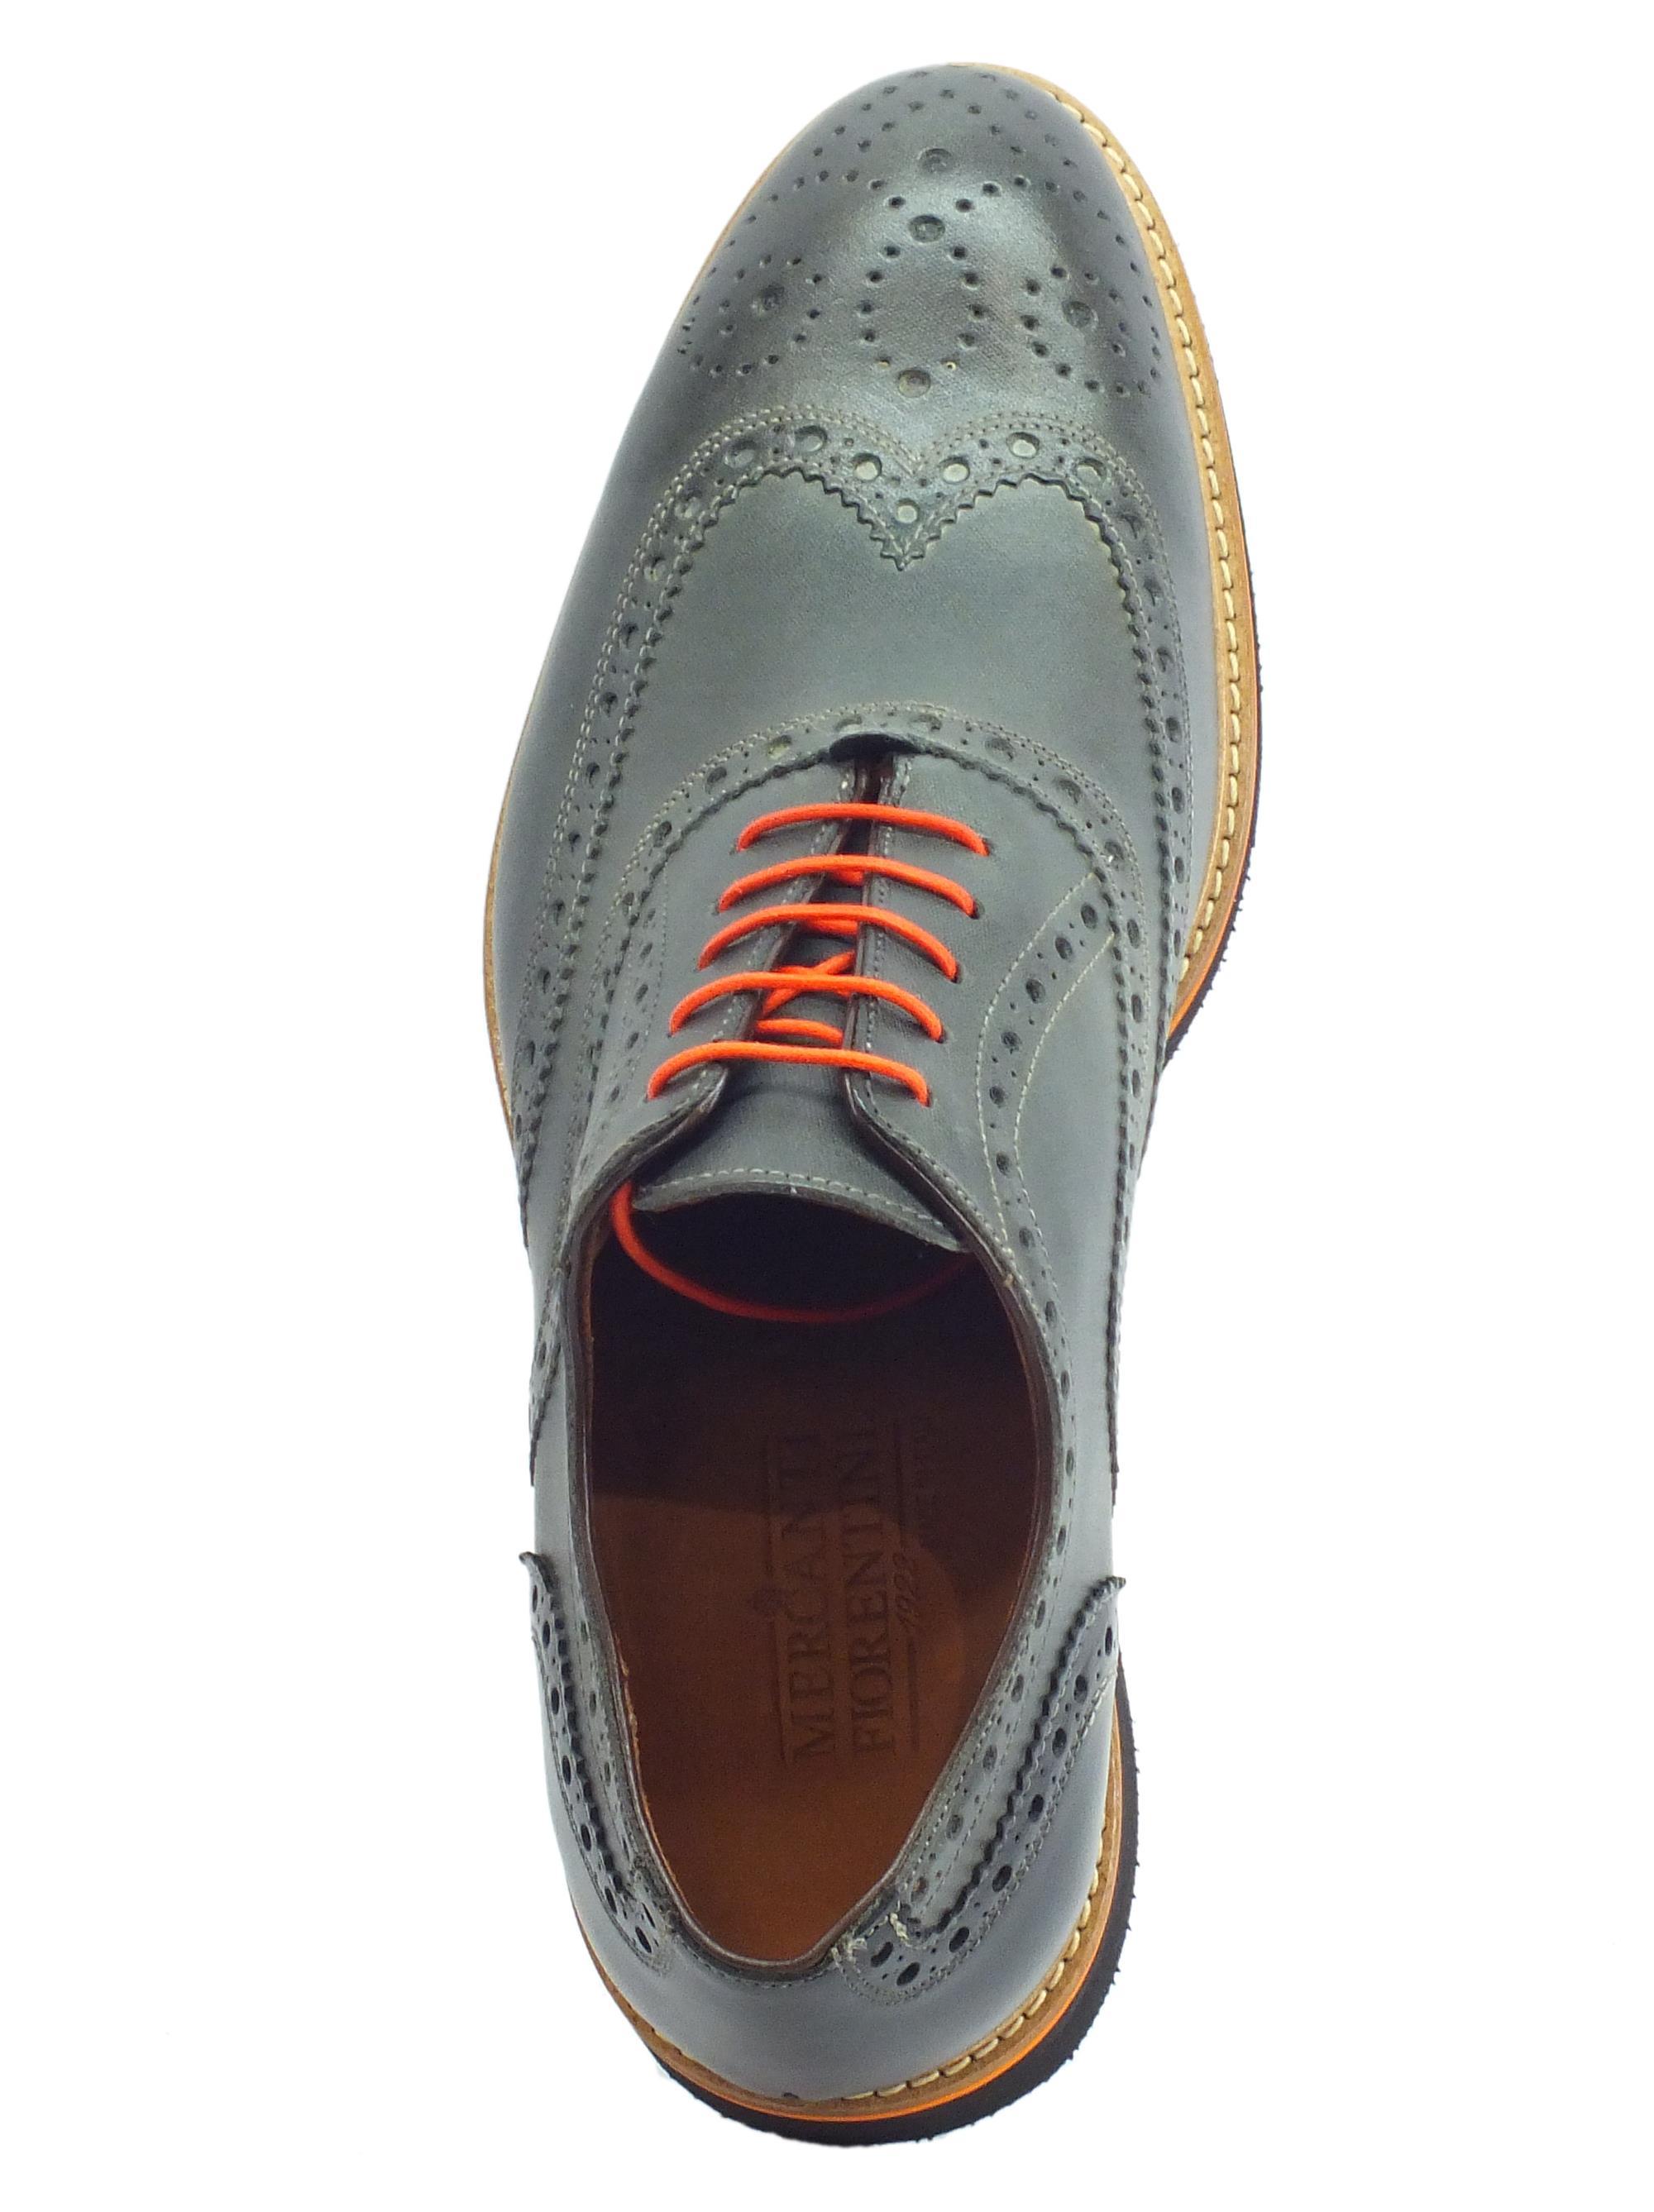 10dcbff42b3ad ... Scarpe eleganti per uomo Mercanti Fiorentini in pelle grigio e nero